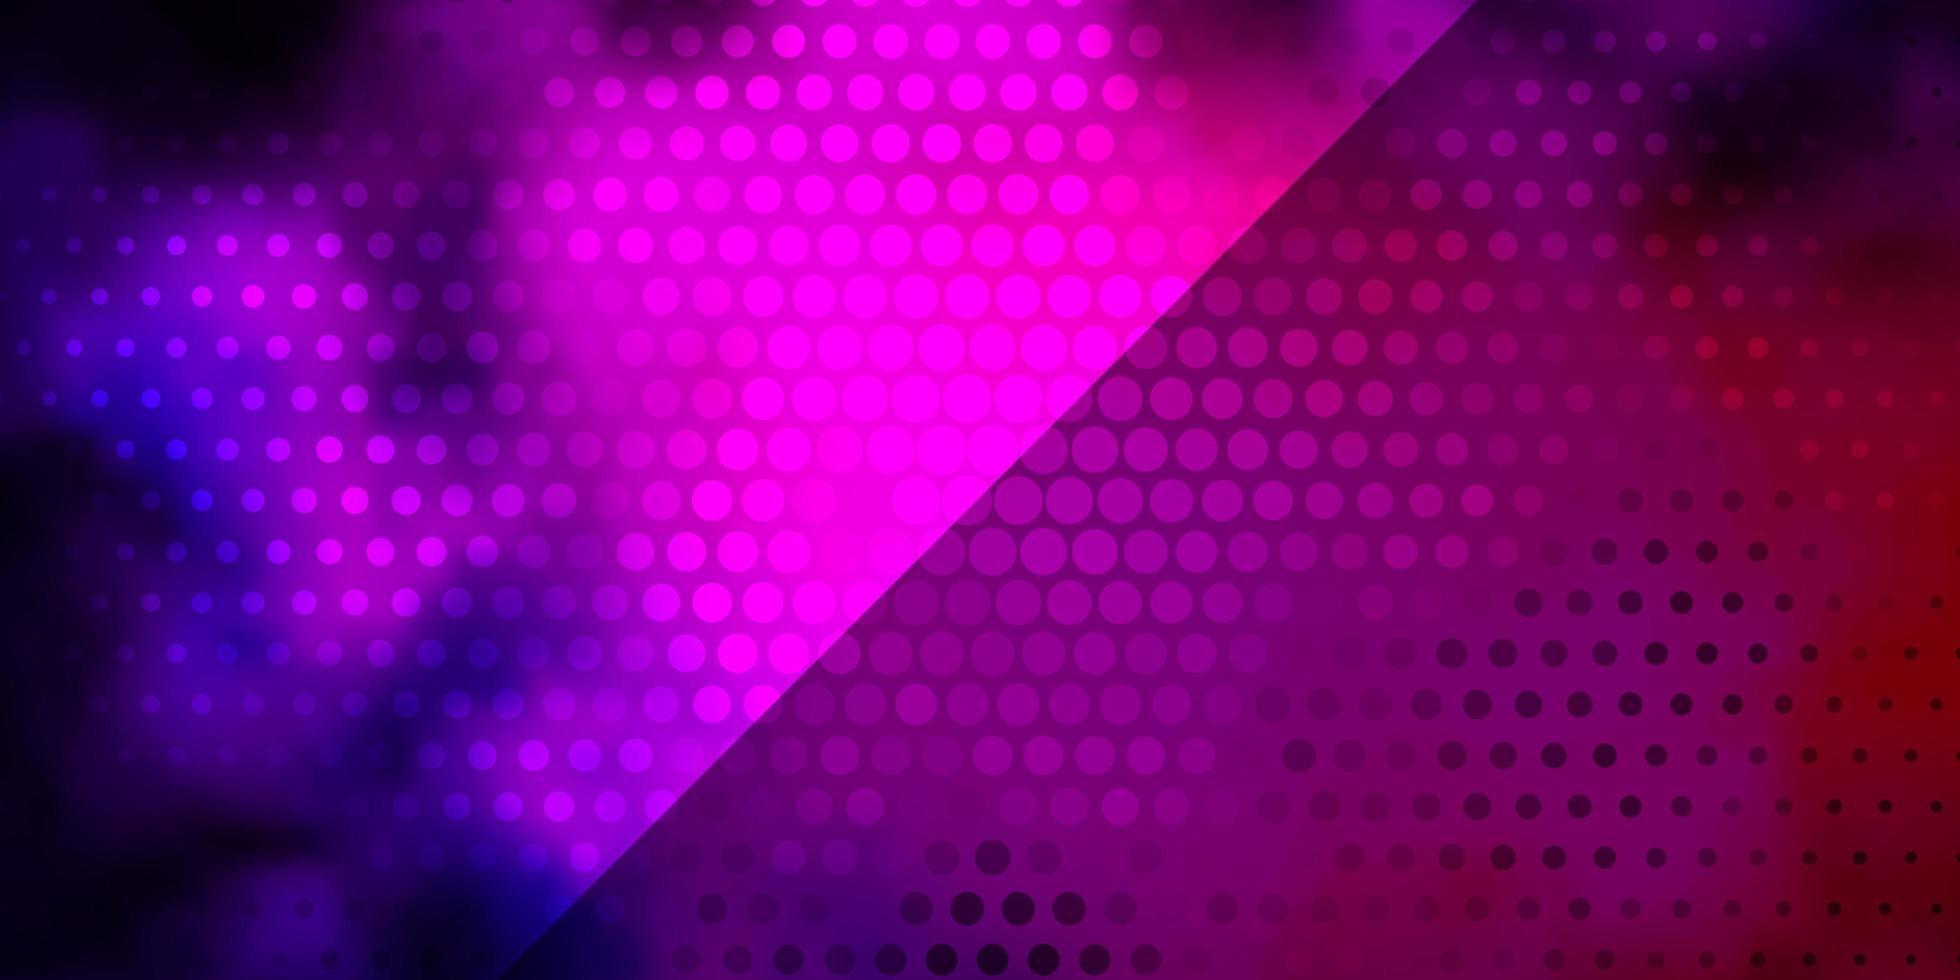 textura de vector de color rosa oscuro, azul con círculos.